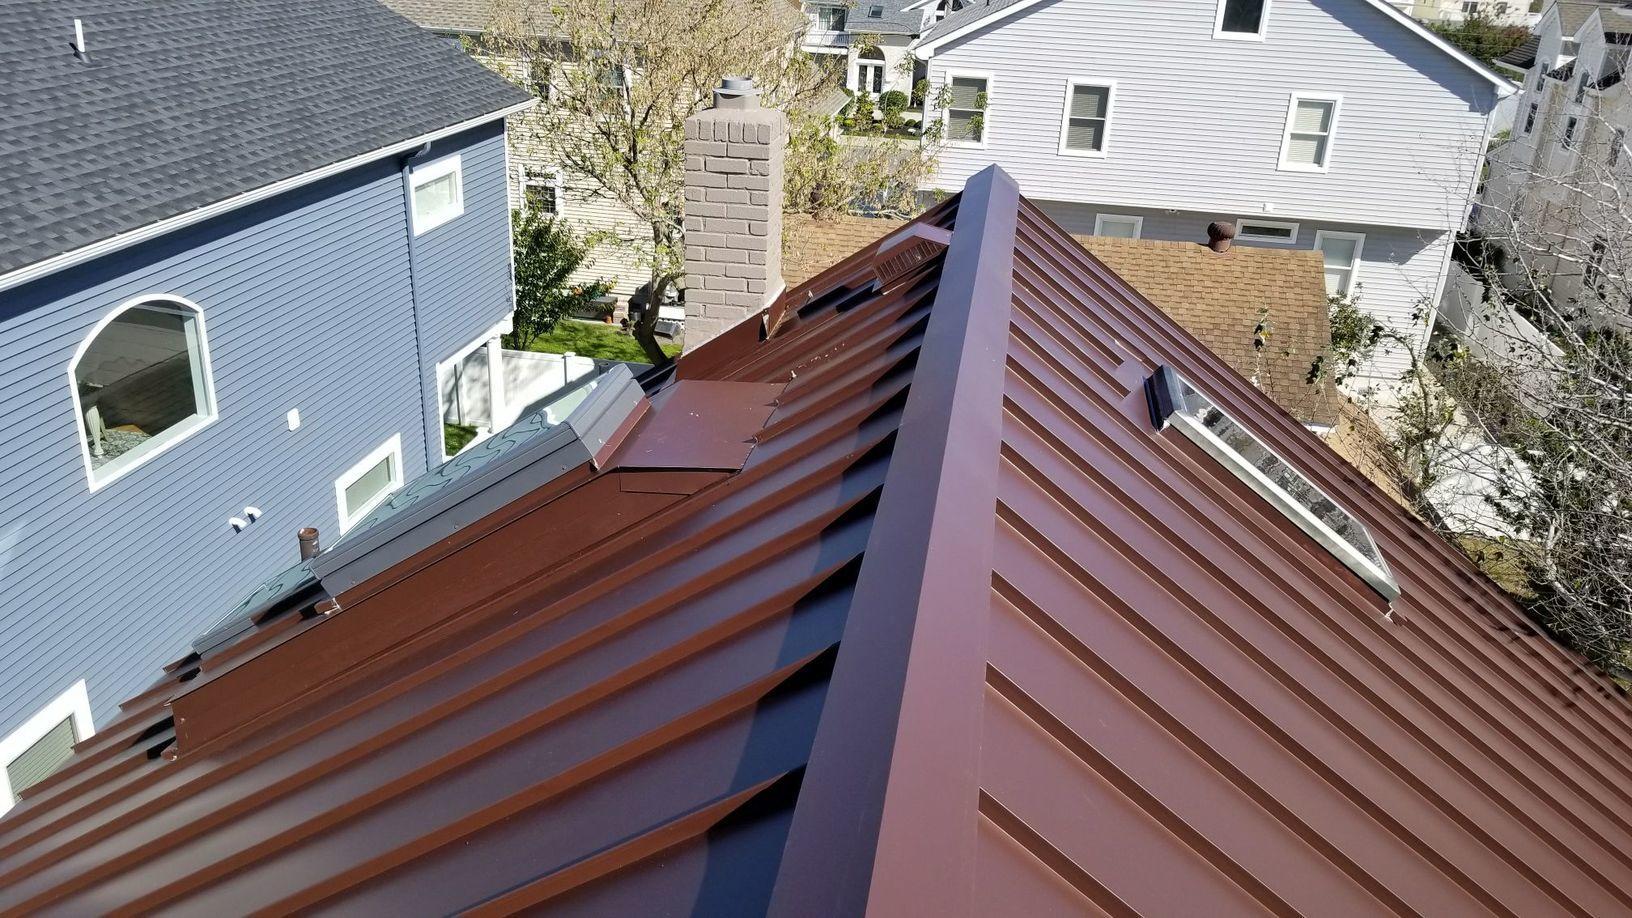 Mansard Brown Standing Seam Metal Roof Installation on Jersey Shore Home in Brigantine, NJ - After Photo